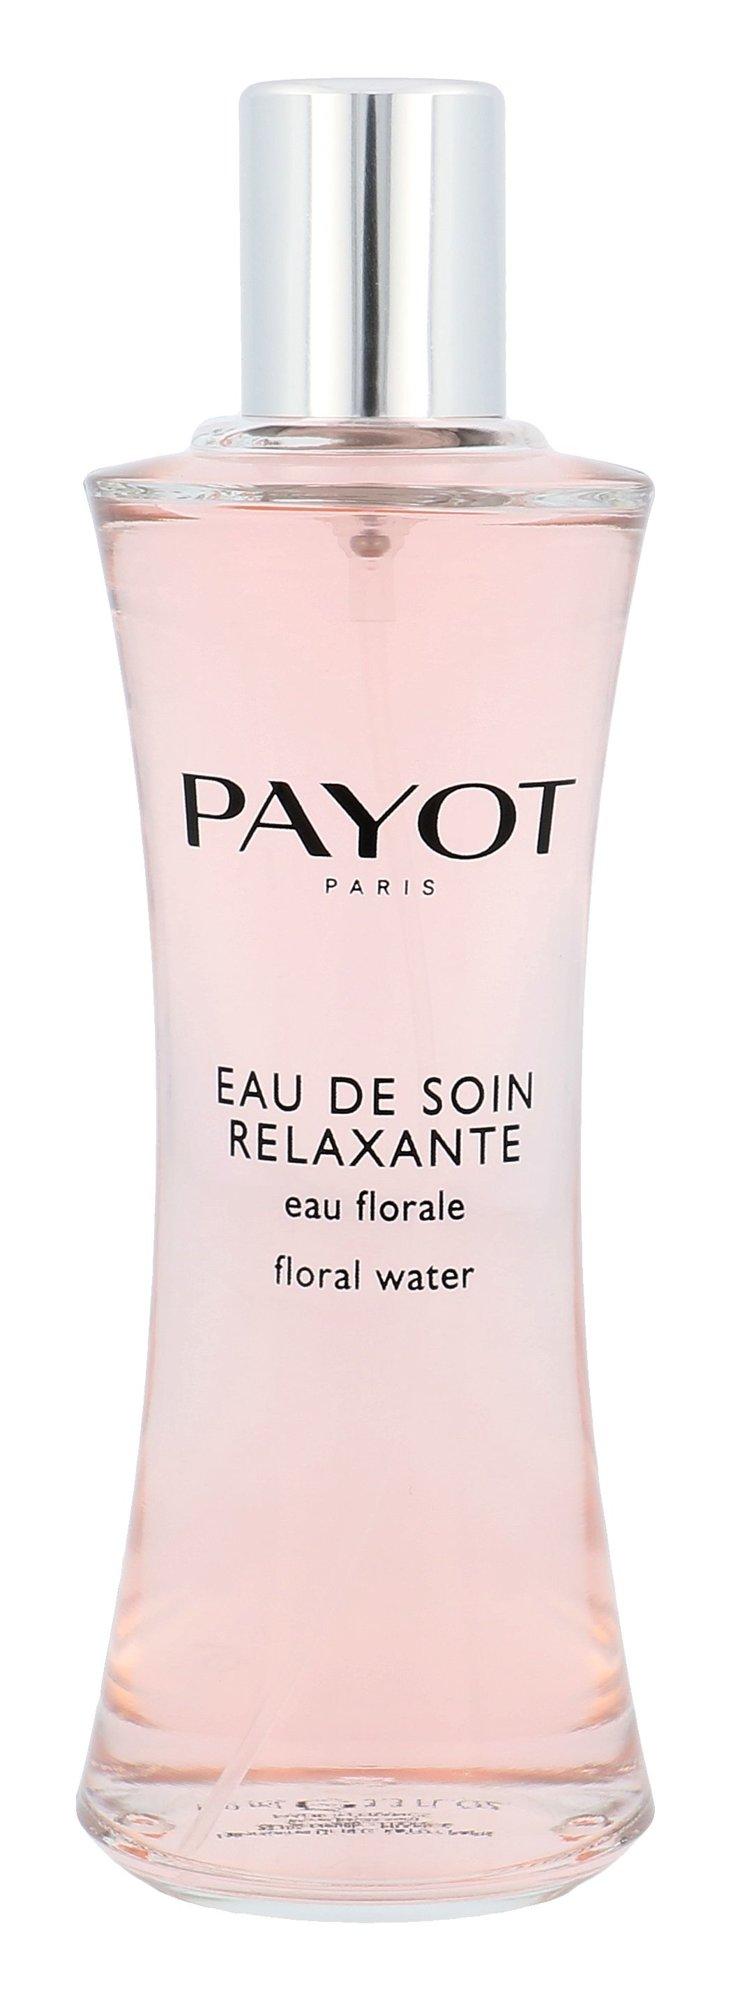 PAYOT Le Corps Tělová voda 100ml  Eau De Soin Relaxante